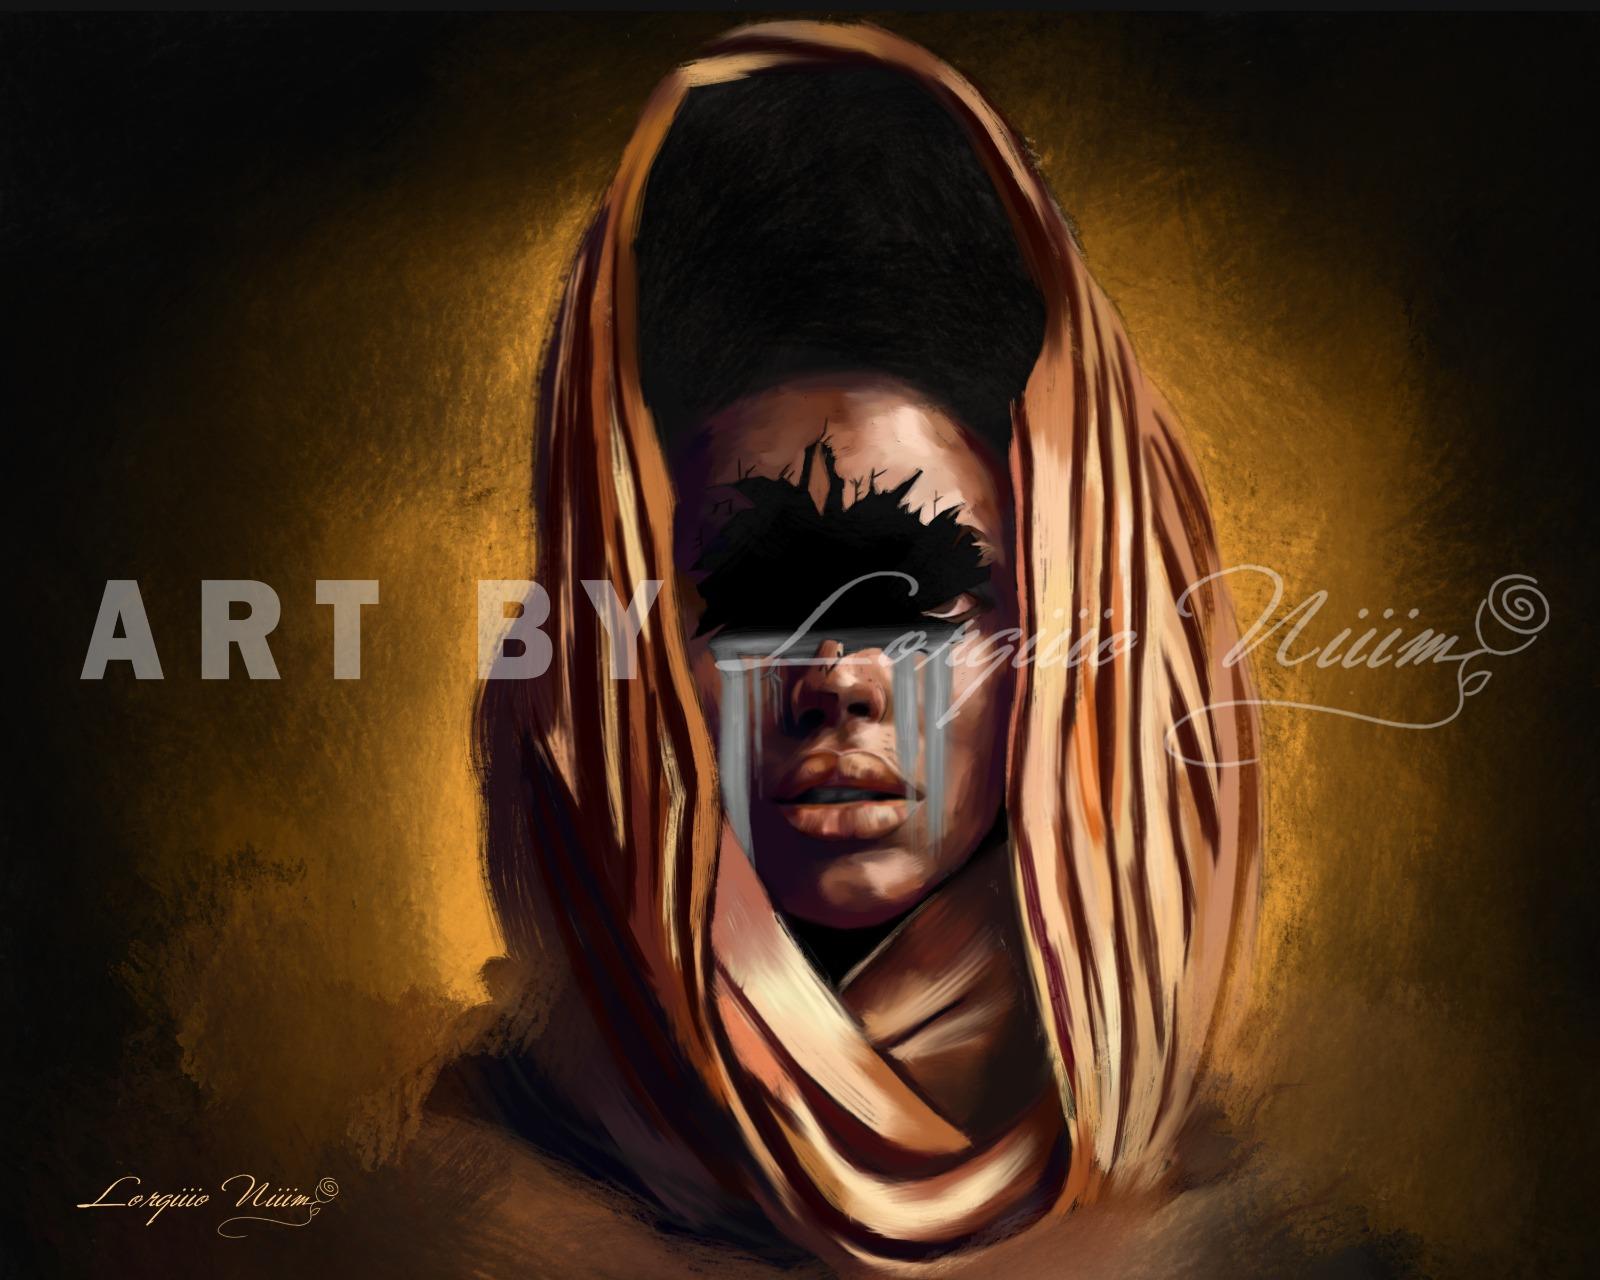 Burundians in the Diaspora: 23 years old Lorgio NIM, the self-taught digital painter tracing his way in Canada!